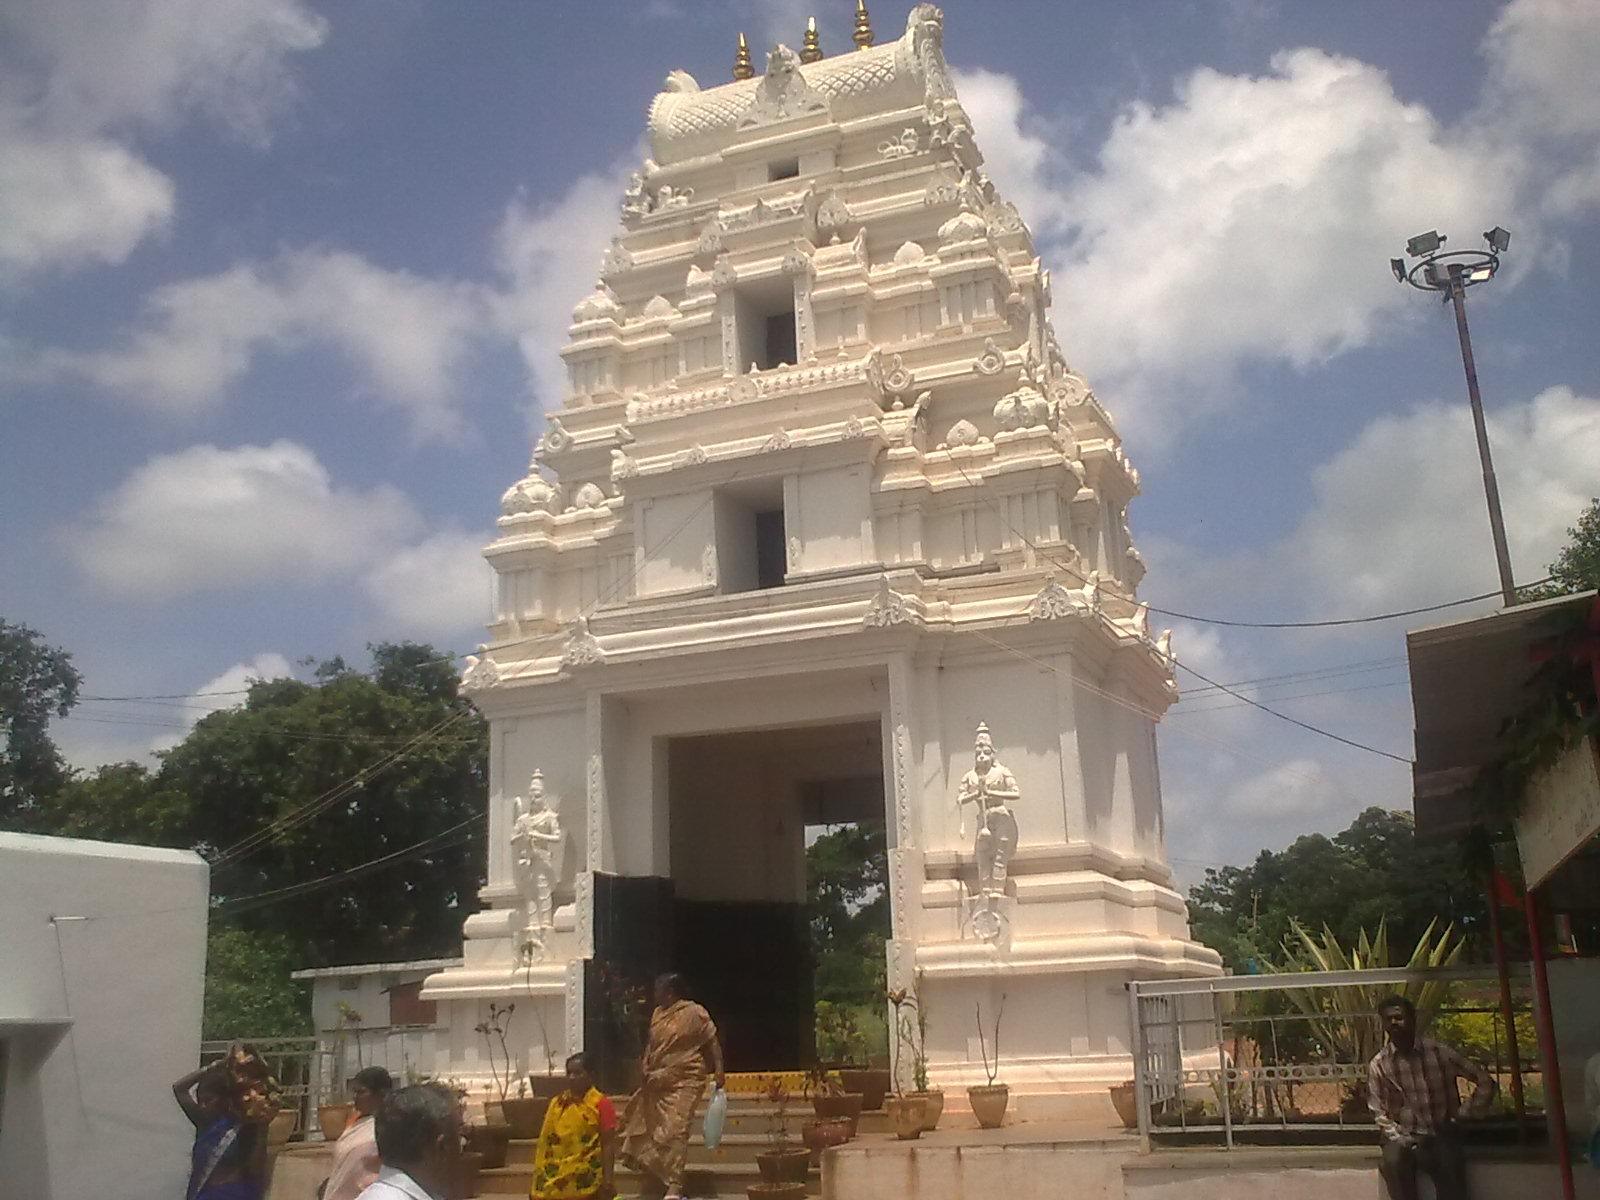 Anantha Padmanabha Swamy Temple, Ananthagiri Hills, Telungana, India